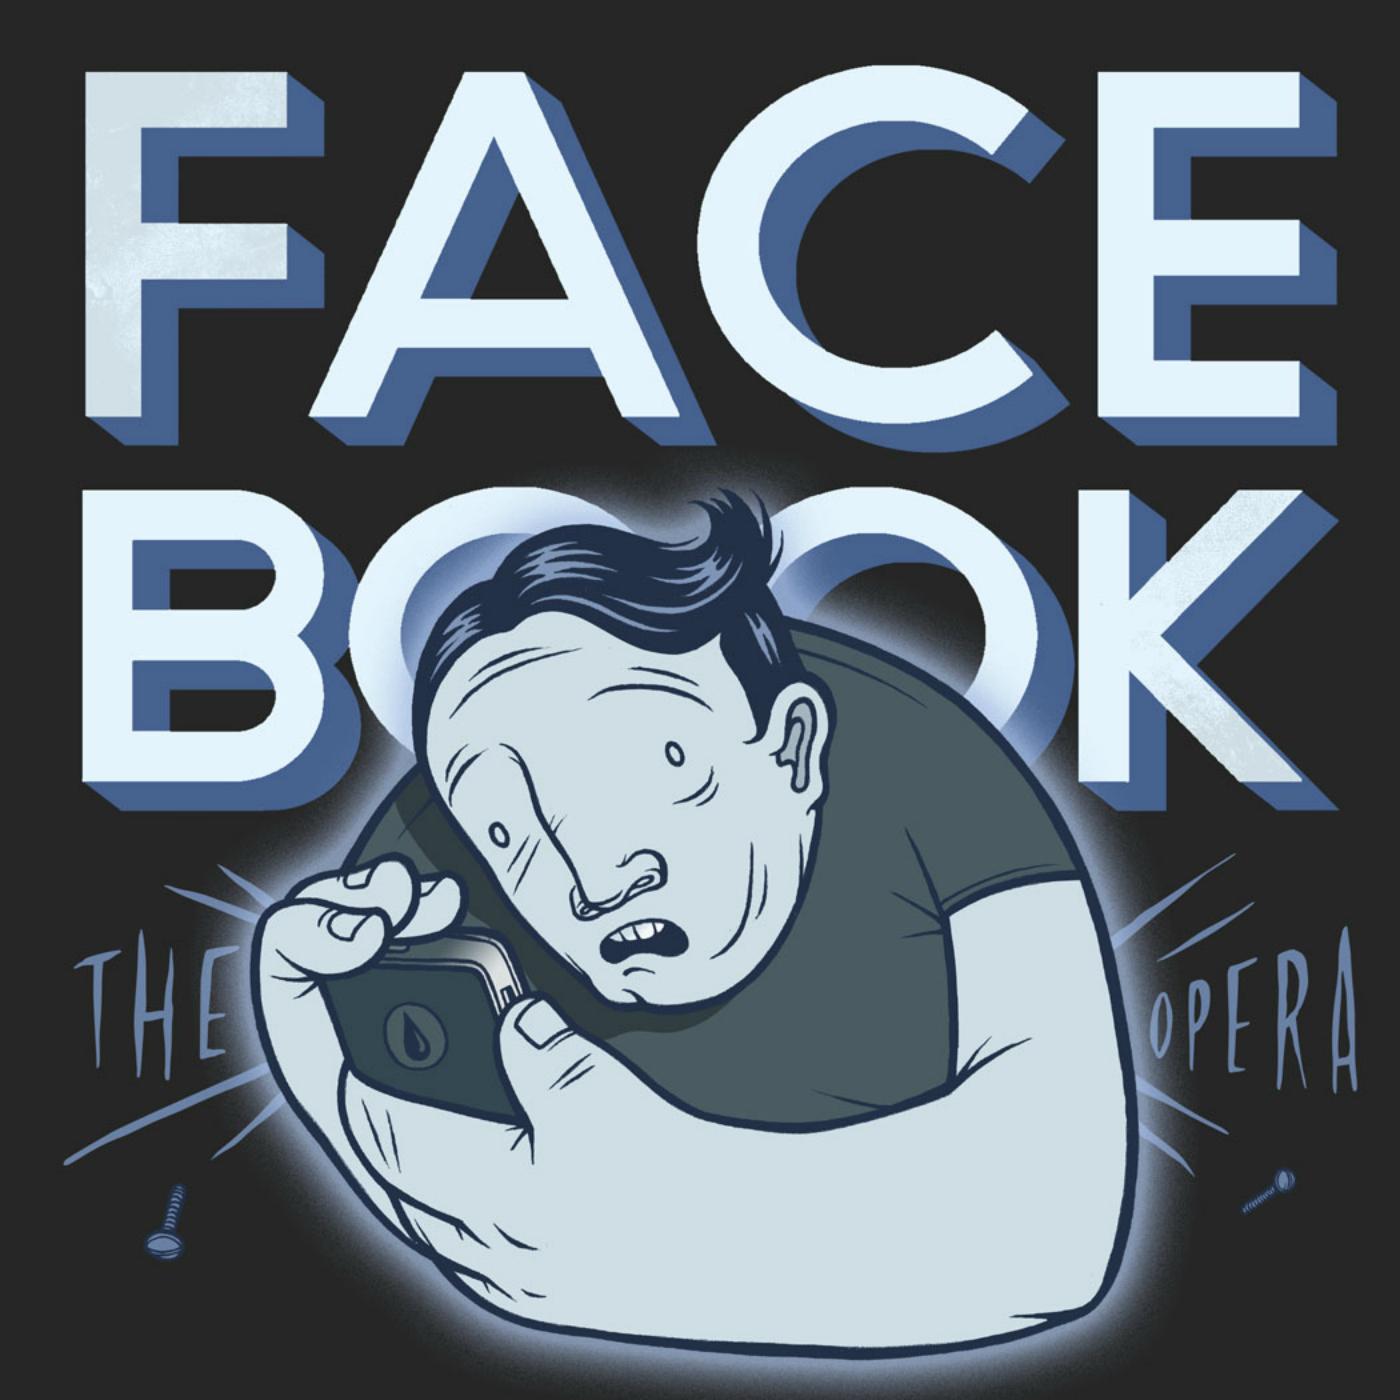 Facebook, the Opera